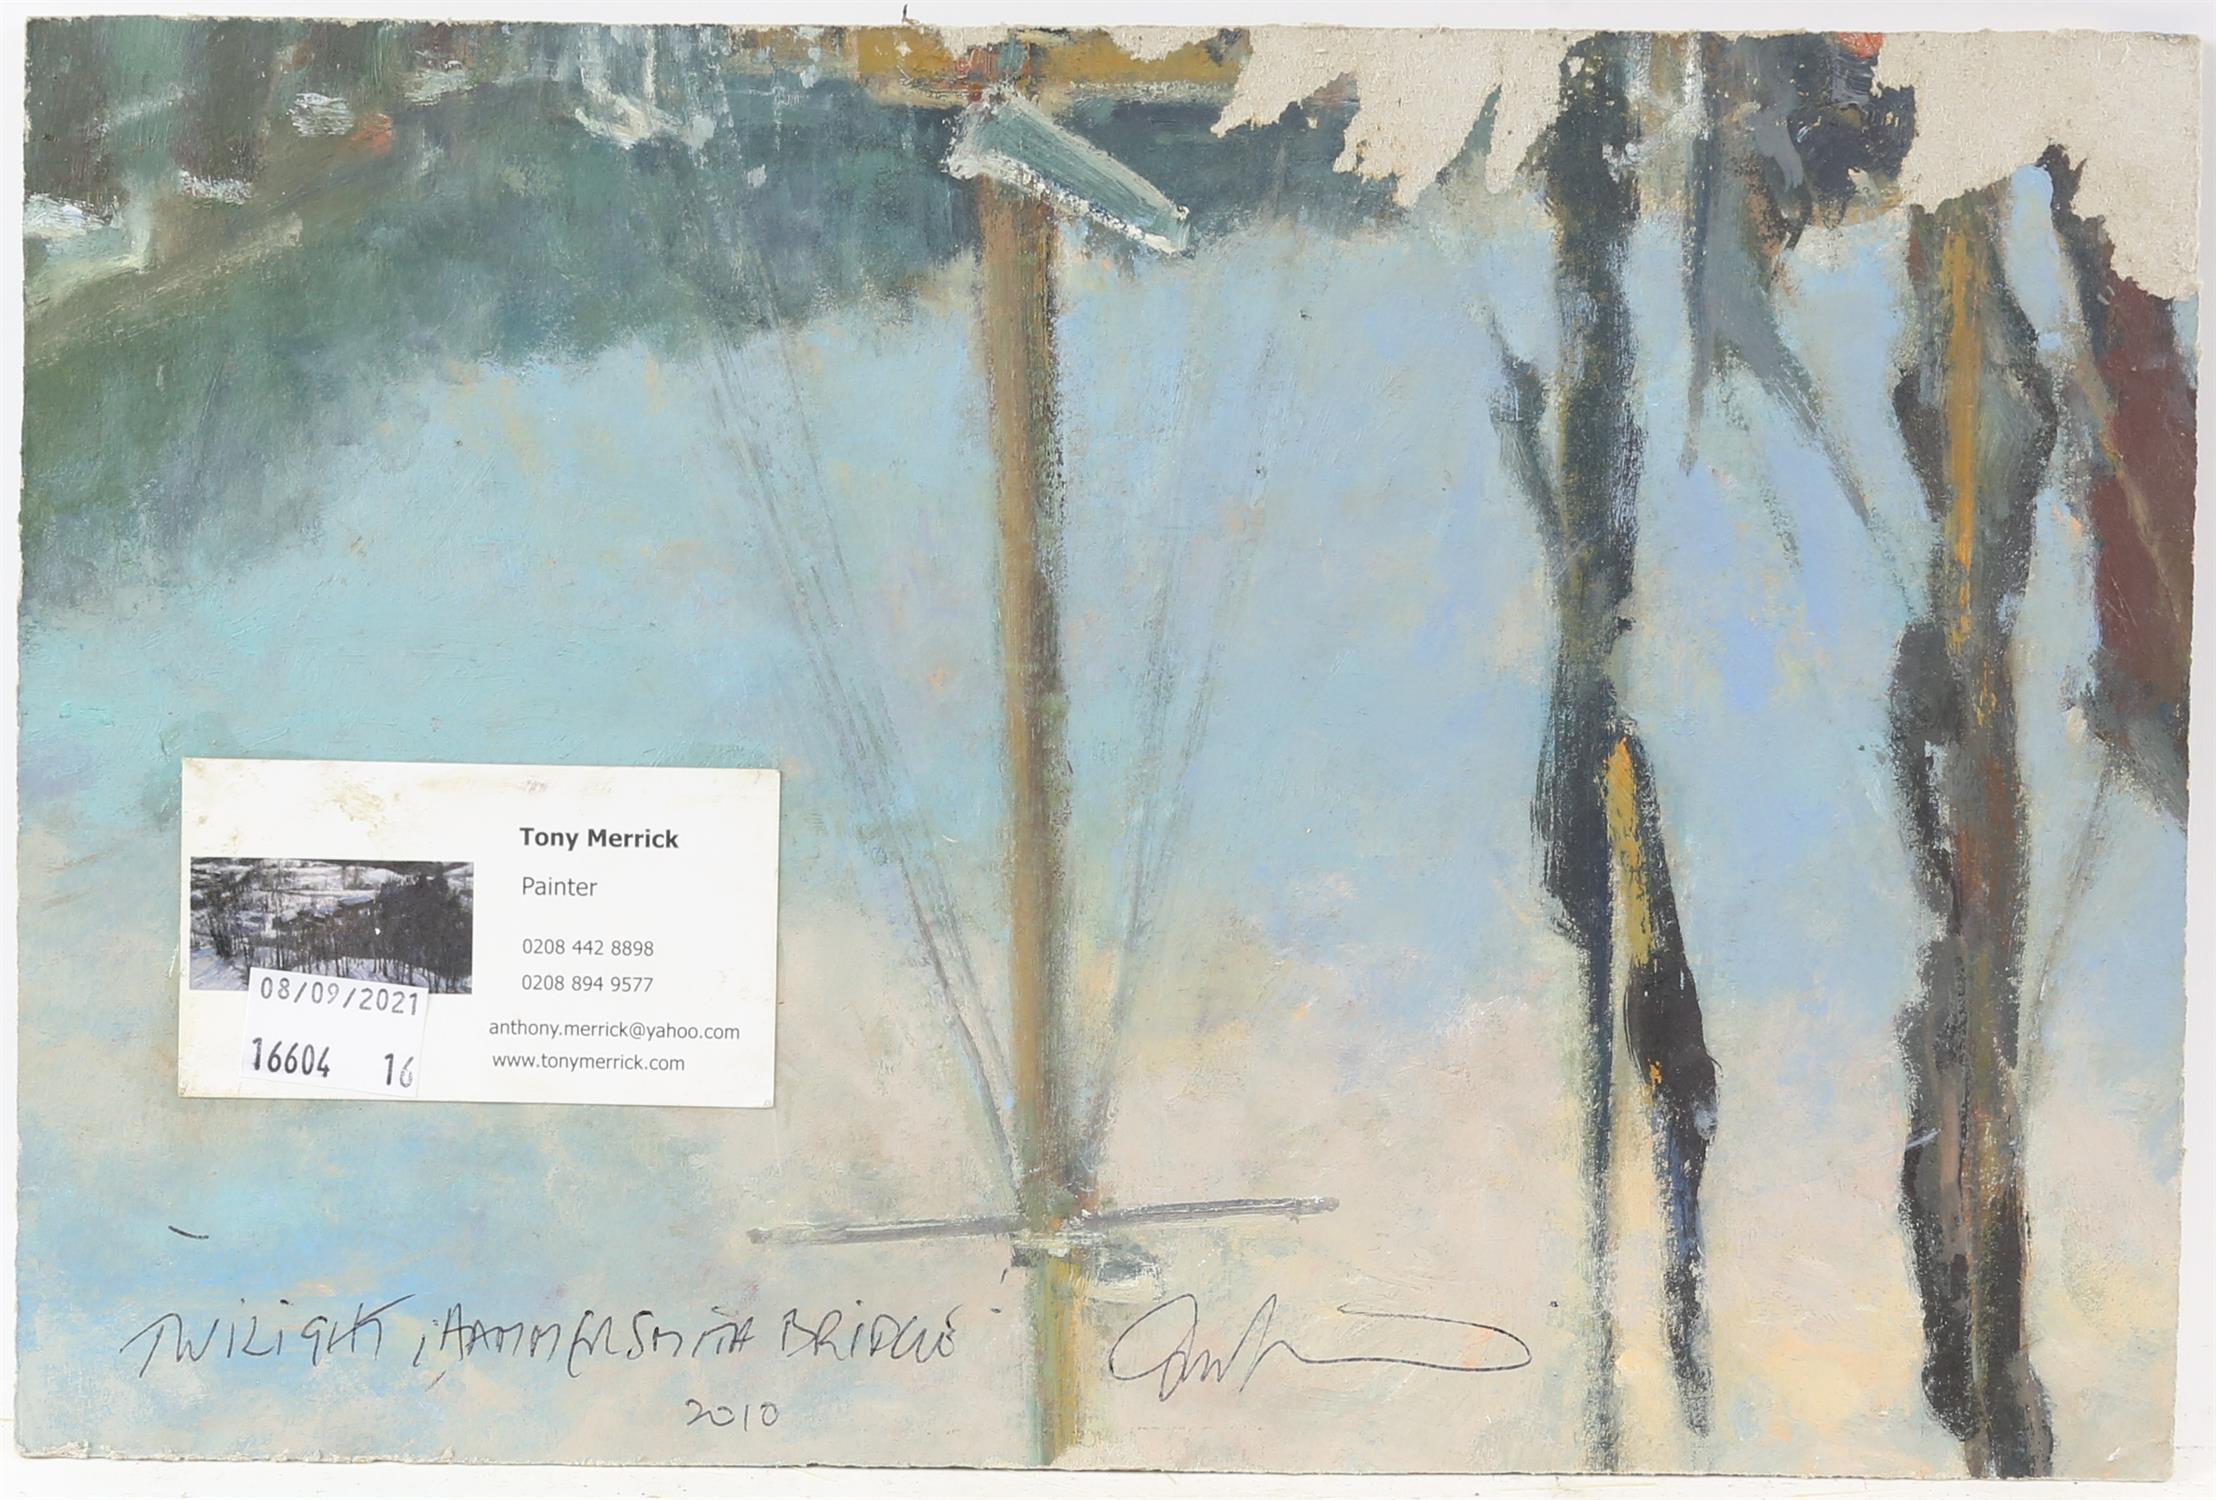 Tony Merrick (British 20th century), 'Twilight, Hammersmith Bridge 2010', inscribed verso, - Image 2 of 2